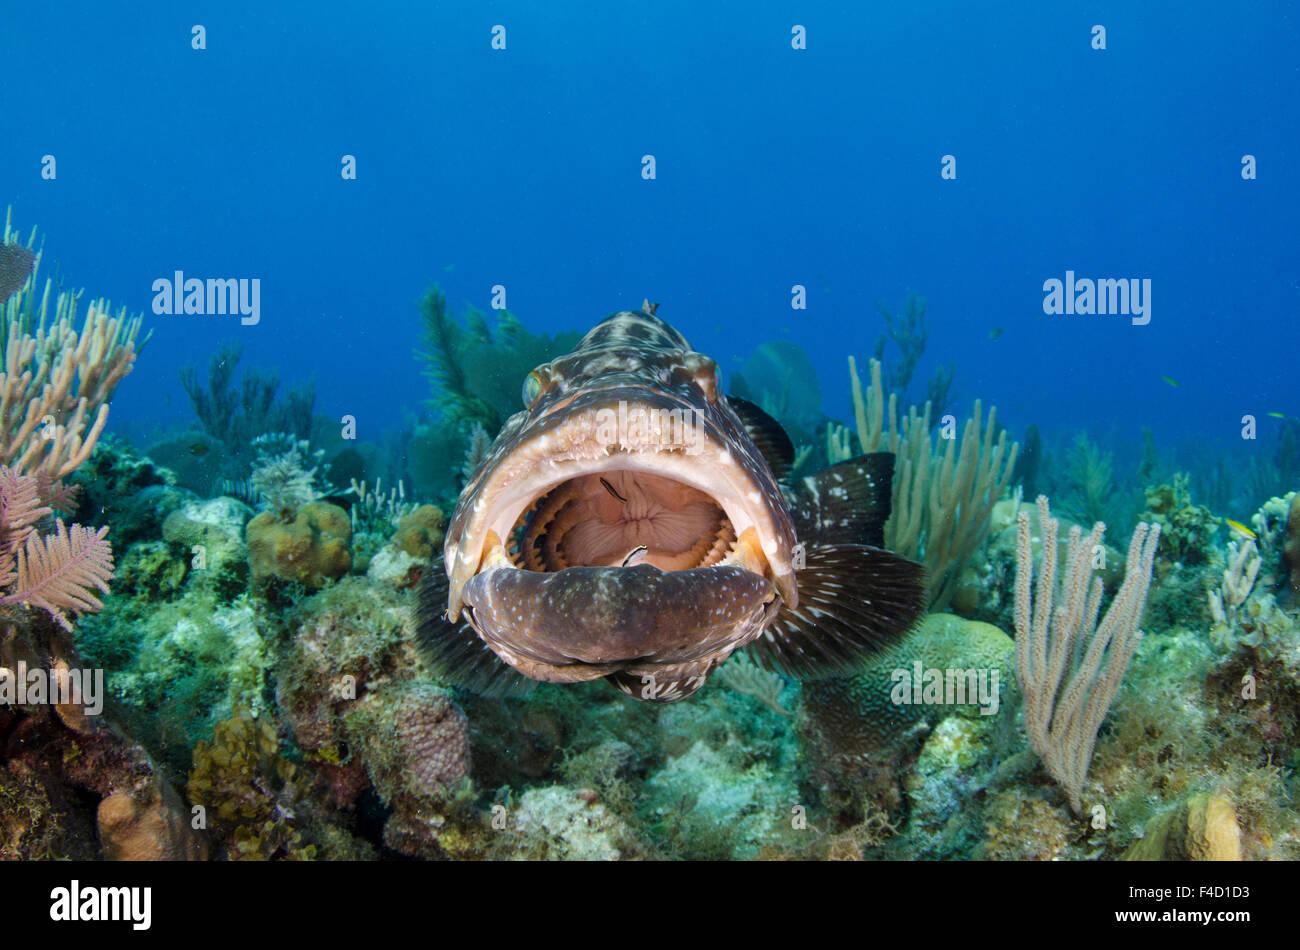 Black grouper mycteroperca bonaci jardines de la reina national stock photo royalty free - Jardines de la reina ...